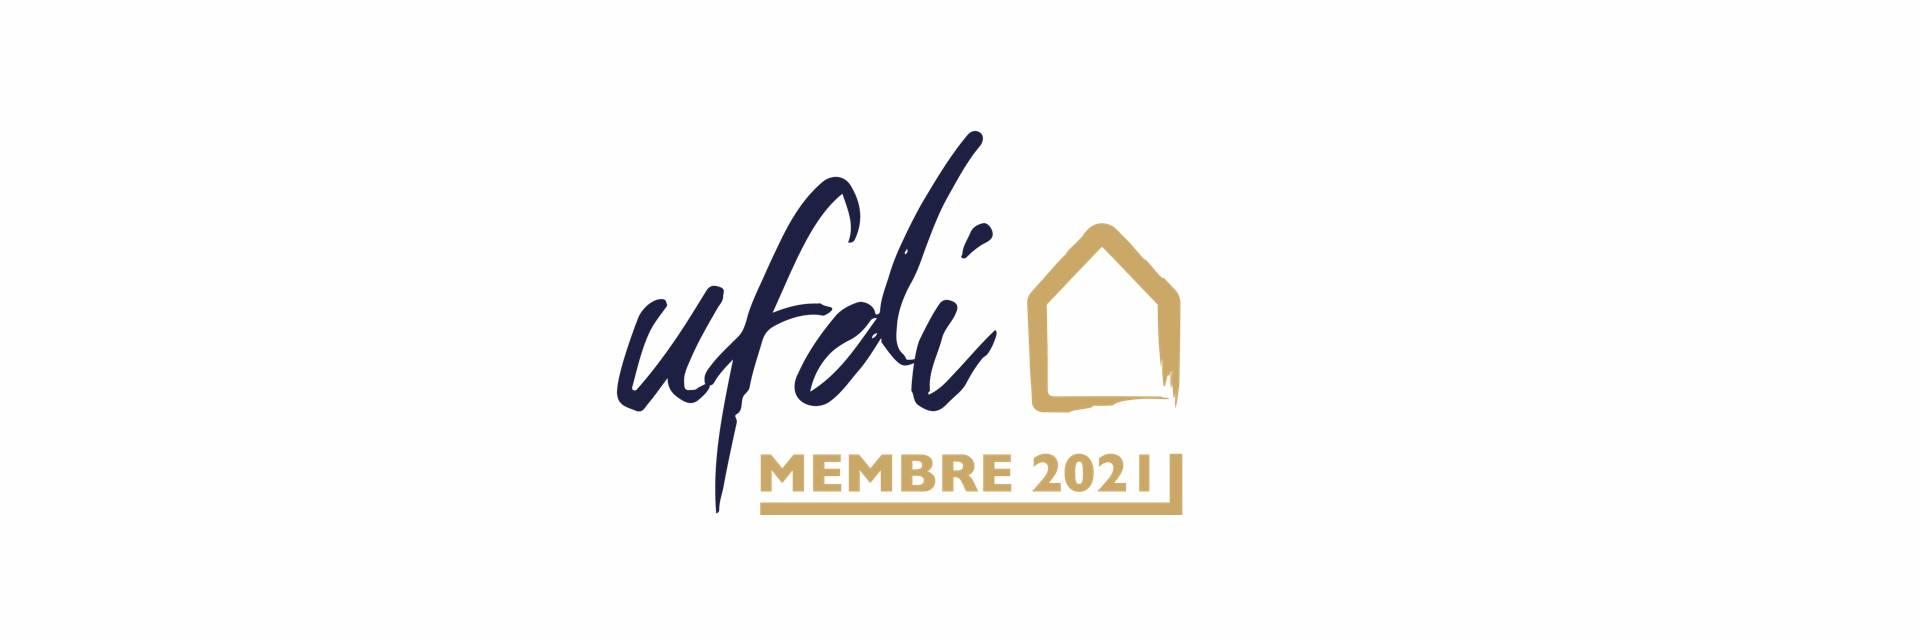 Nathalie Bossard décoration architecture intérieur Rennes 35 UFDI-390